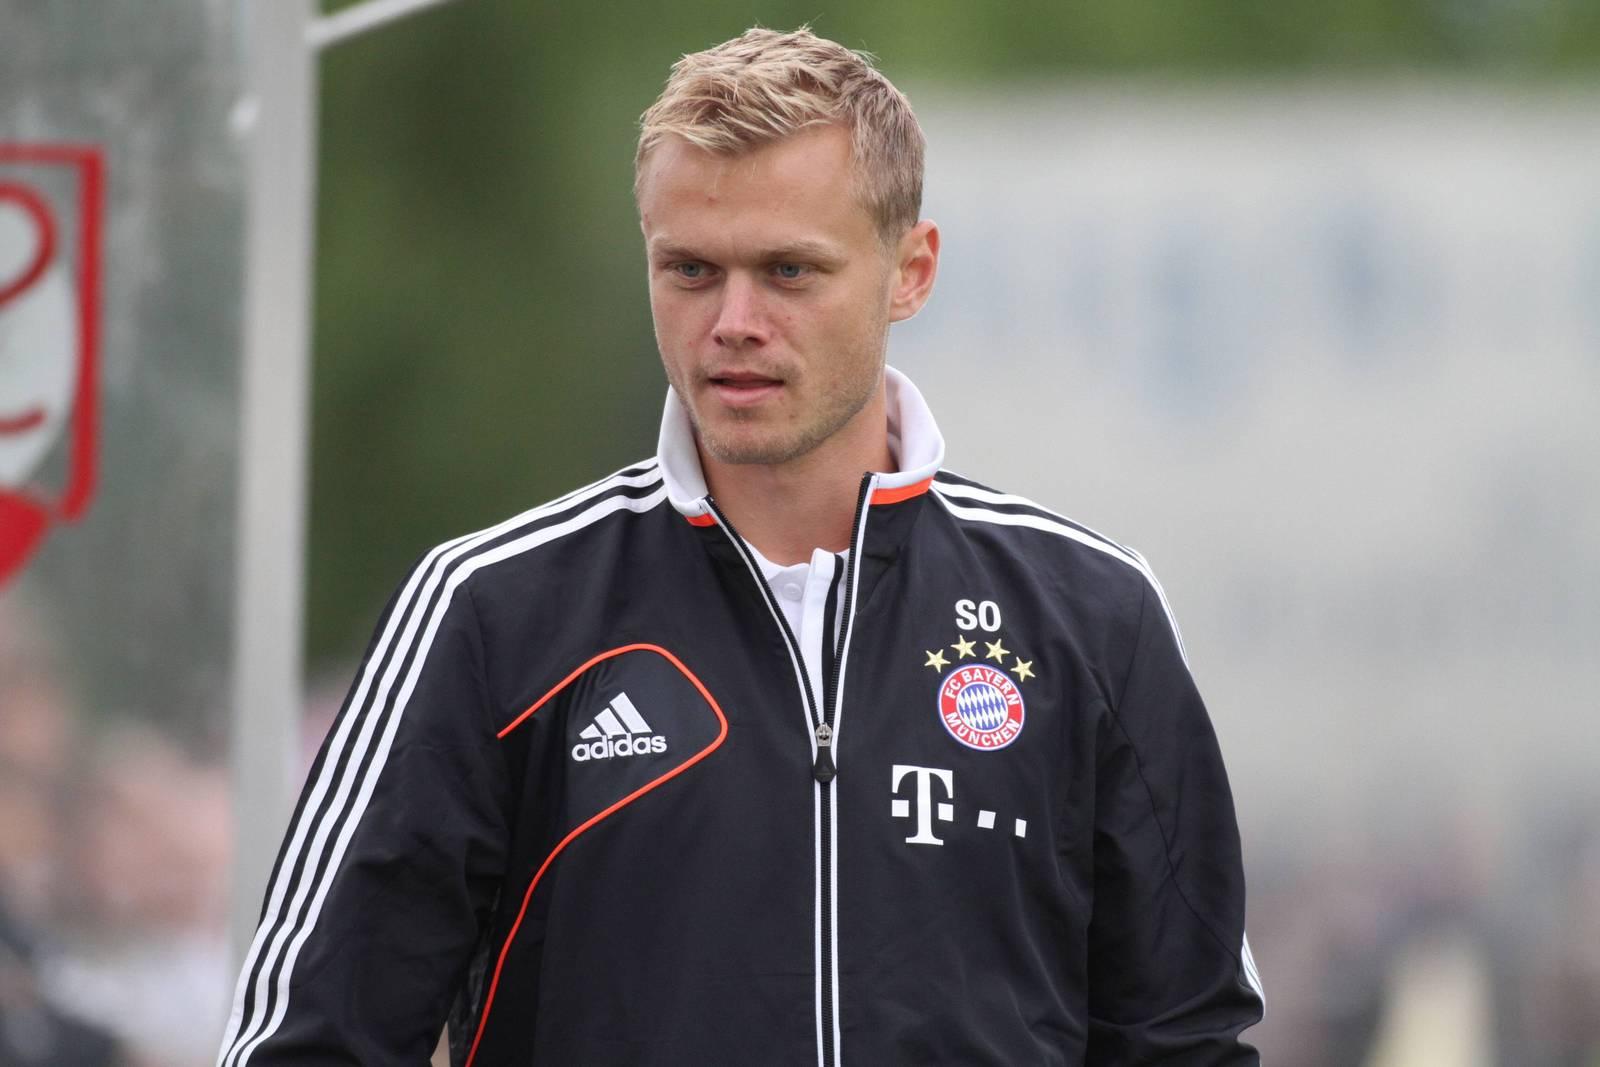 Sören Osterland beim FC Bayern